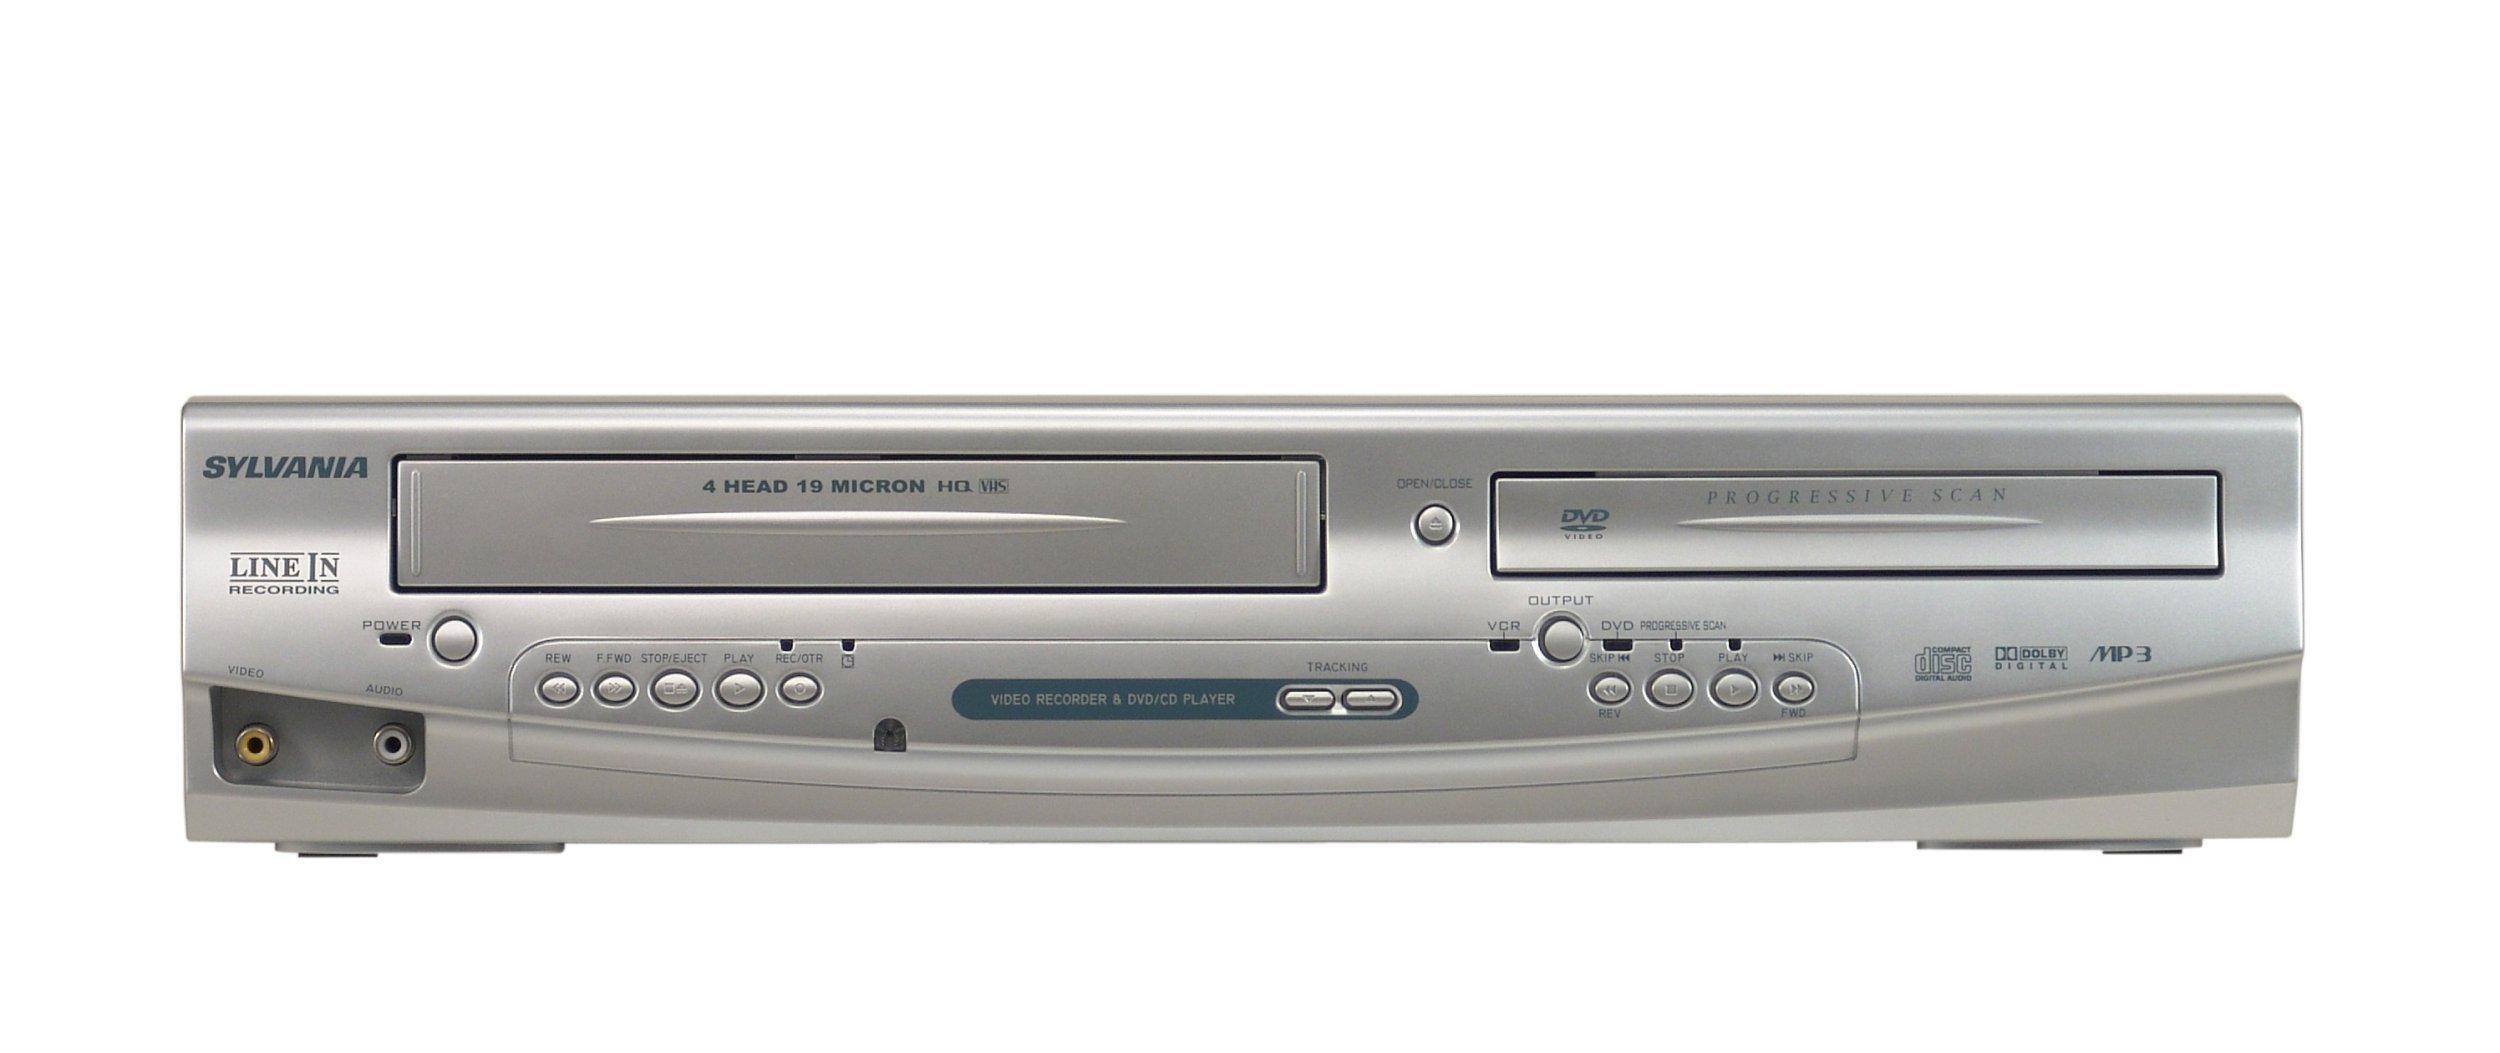 Sylvania DV220SL8 Tunerless Dual Deck DVD Player/VCR Combo